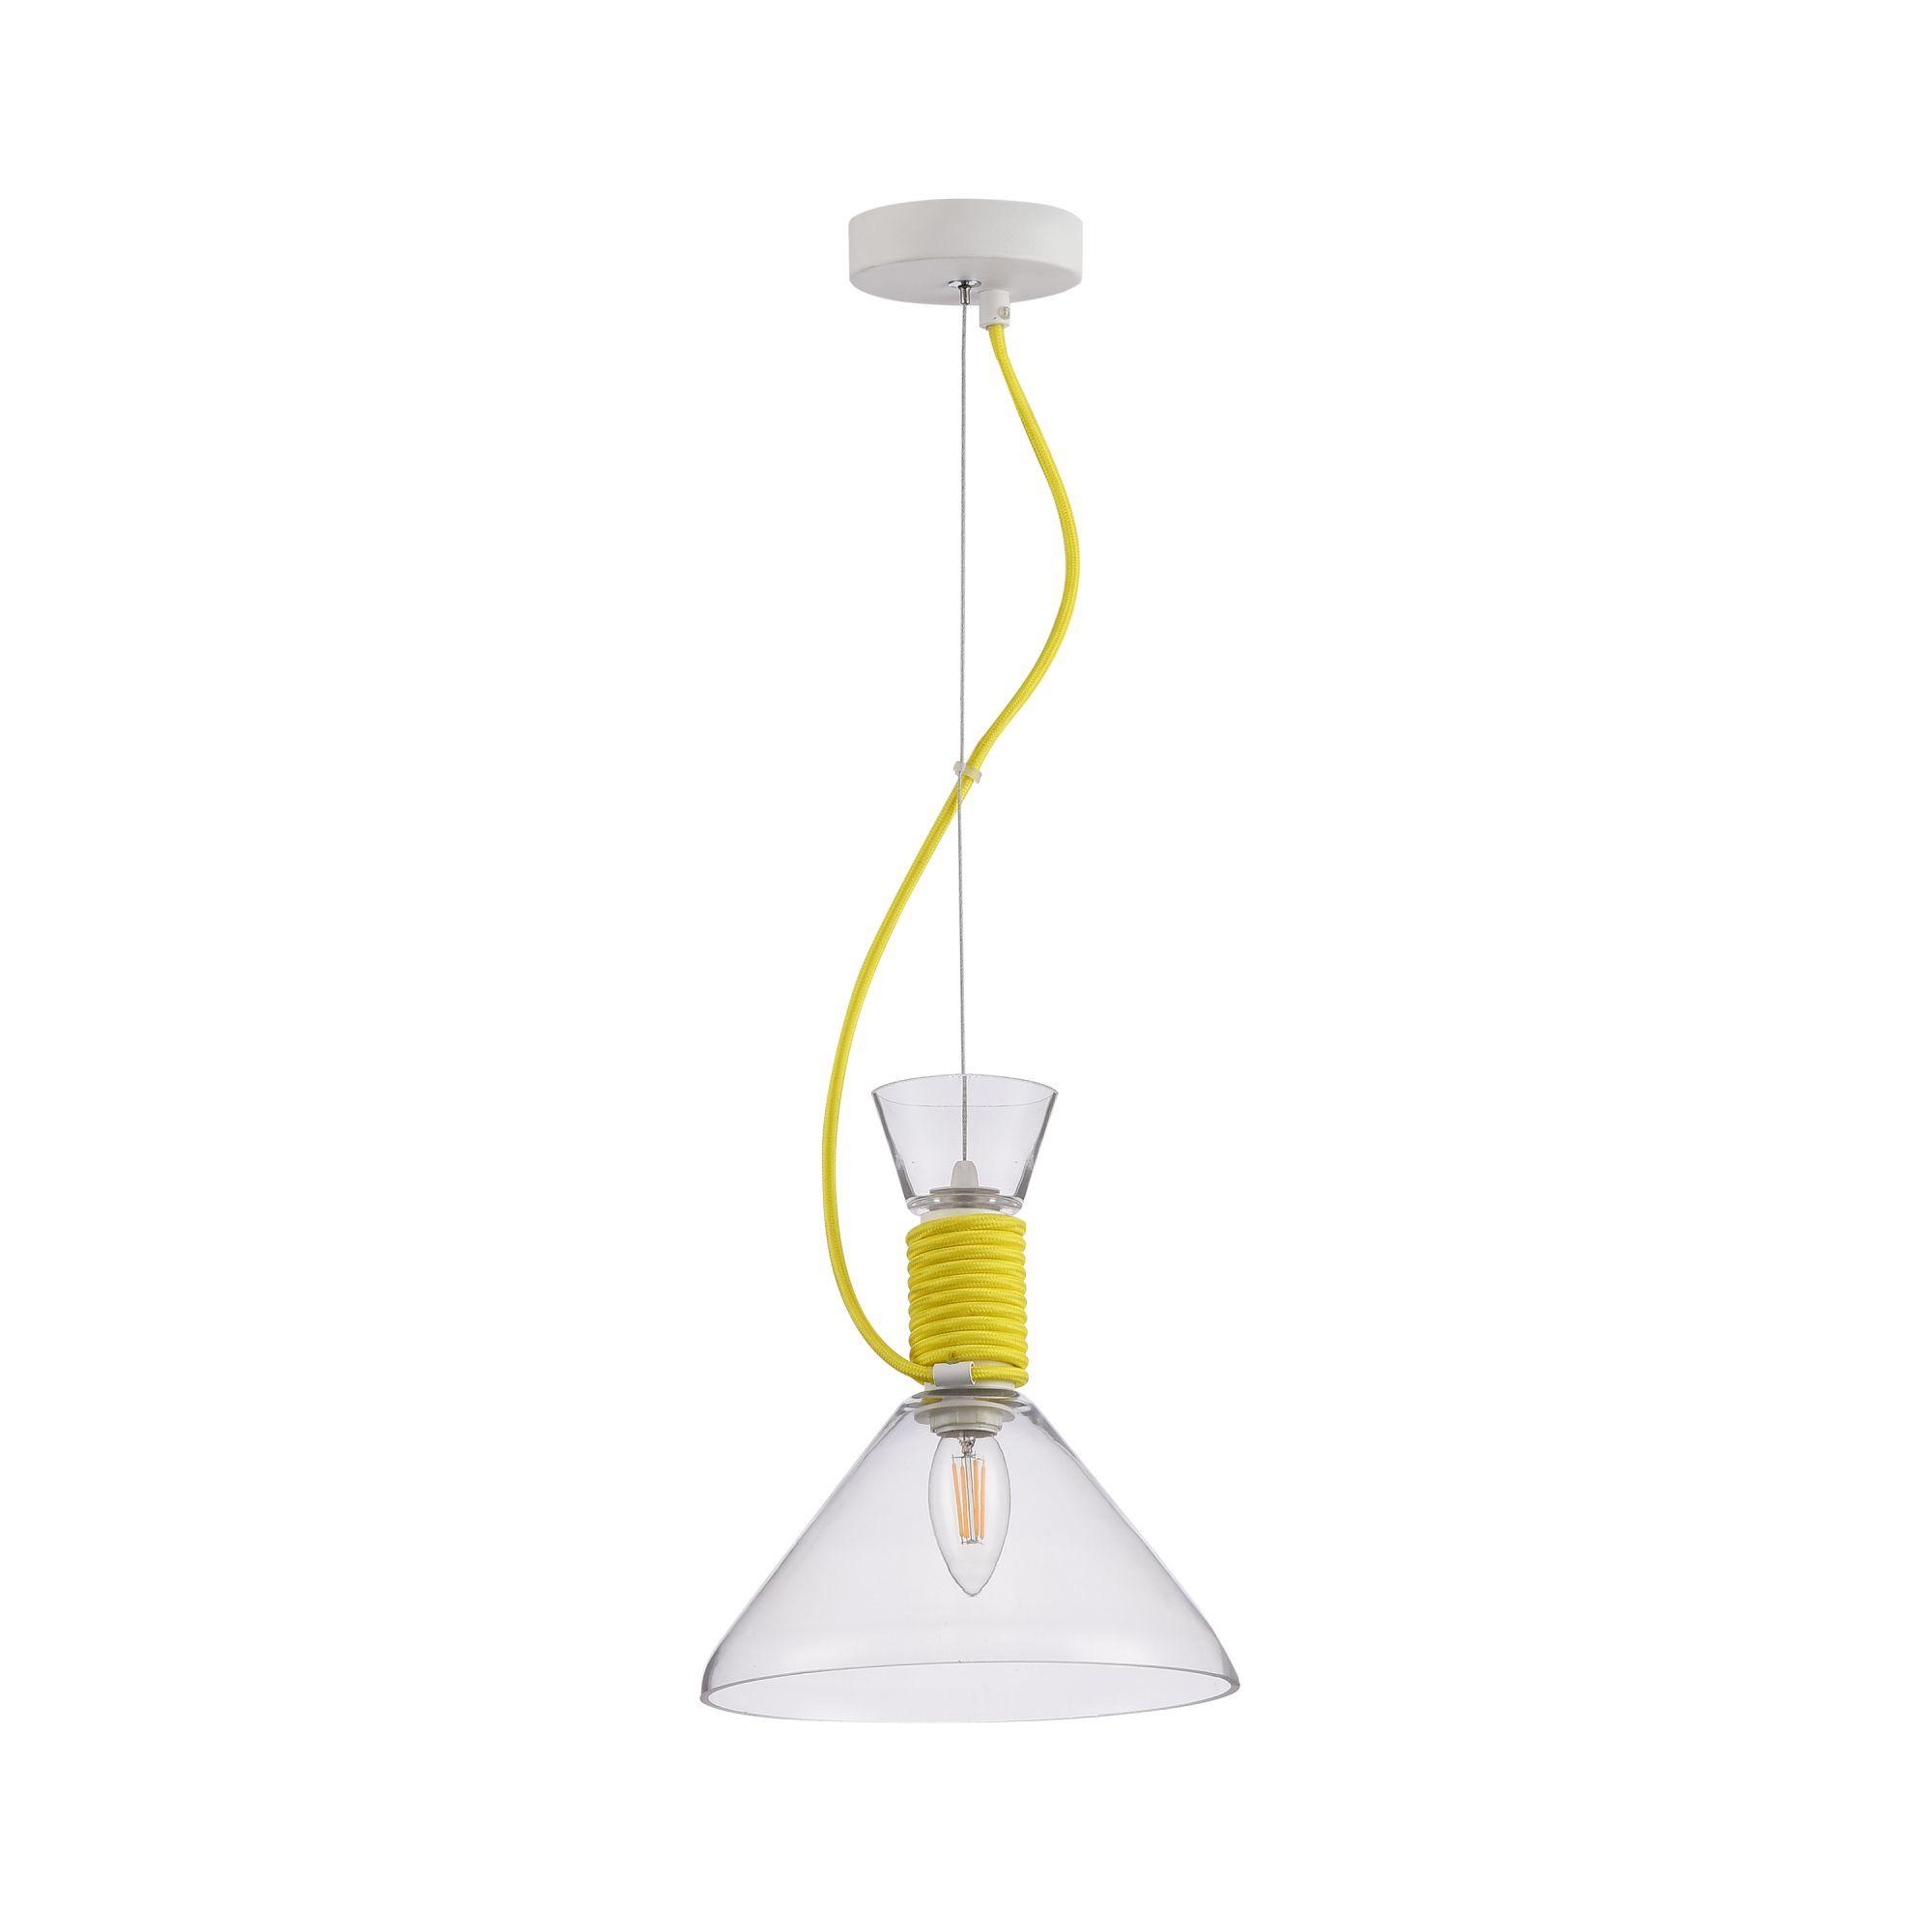 Подвесной светильник Maytoni Modern California P536PL-01YW, 1xE14x40W, белый, желтый, прозрачный, металл, стекло - фото 3